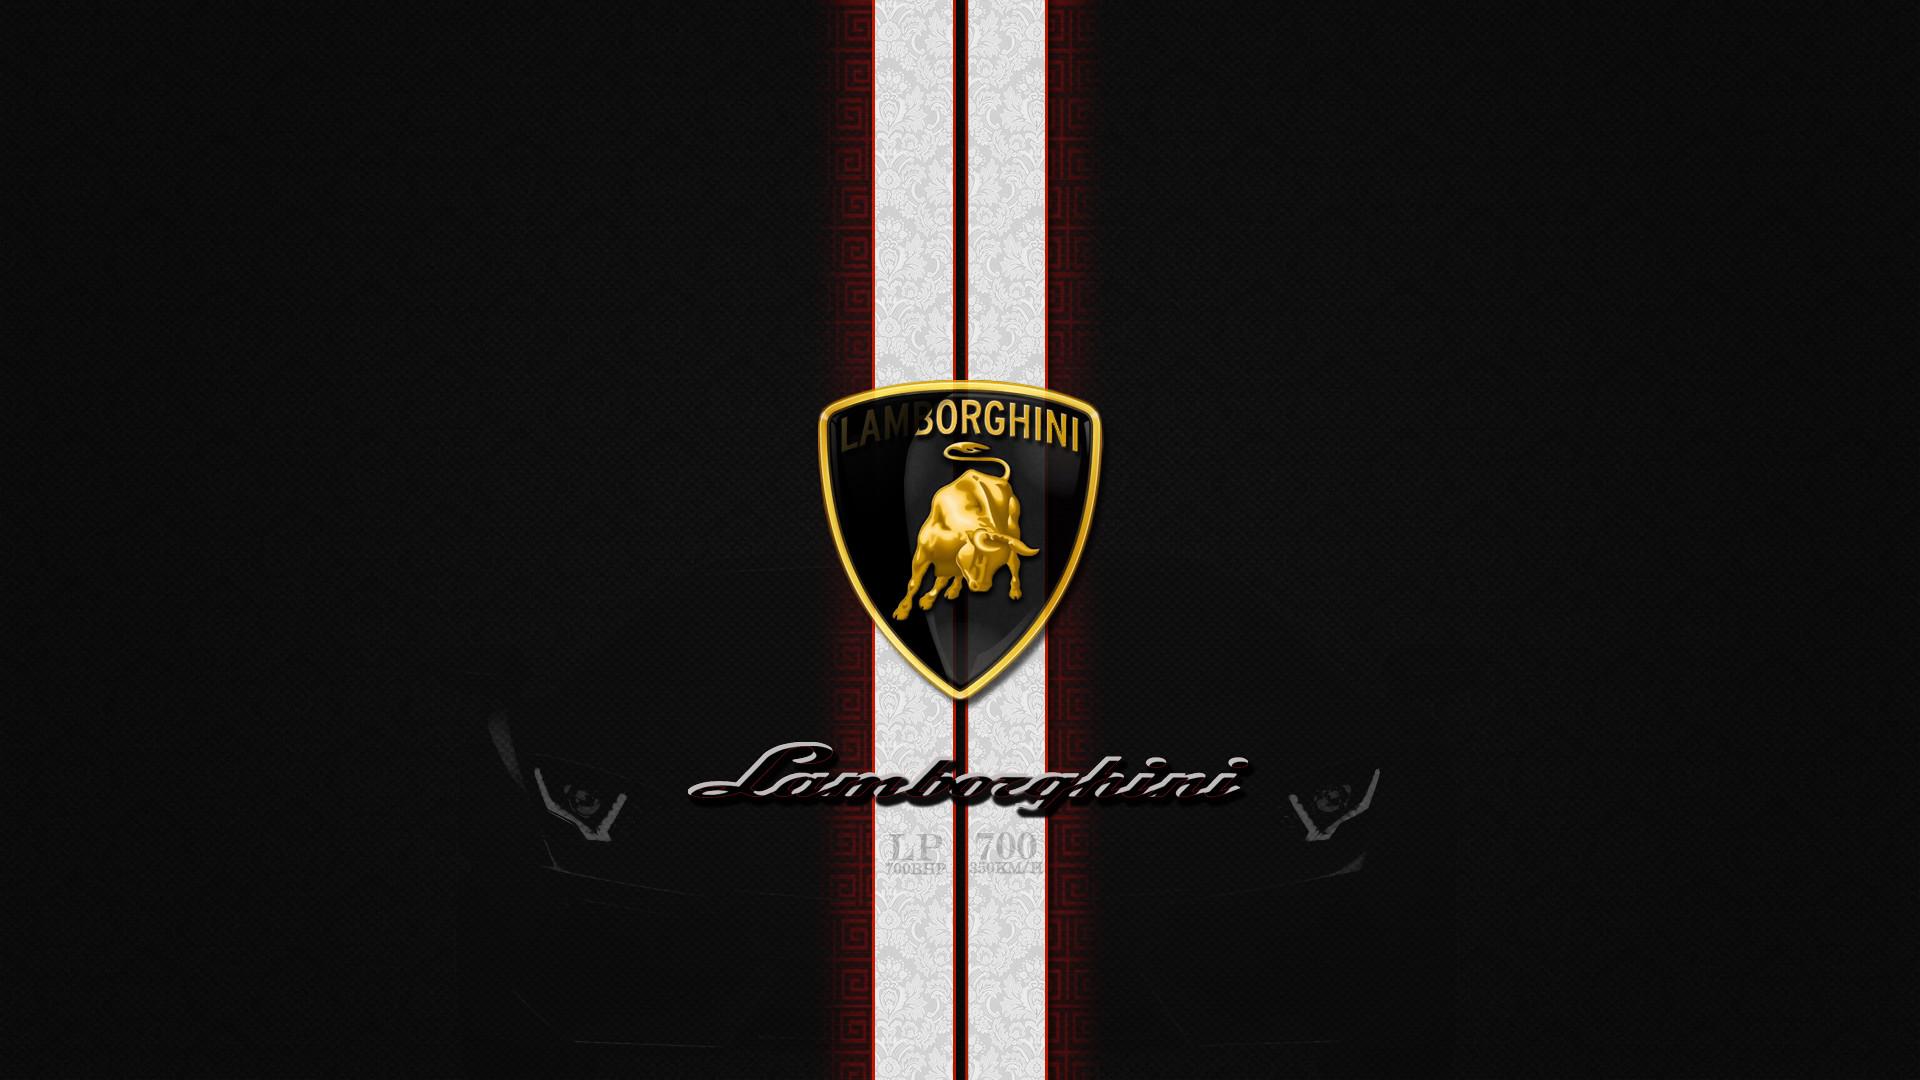 ferrari logo wallpaper 64 images